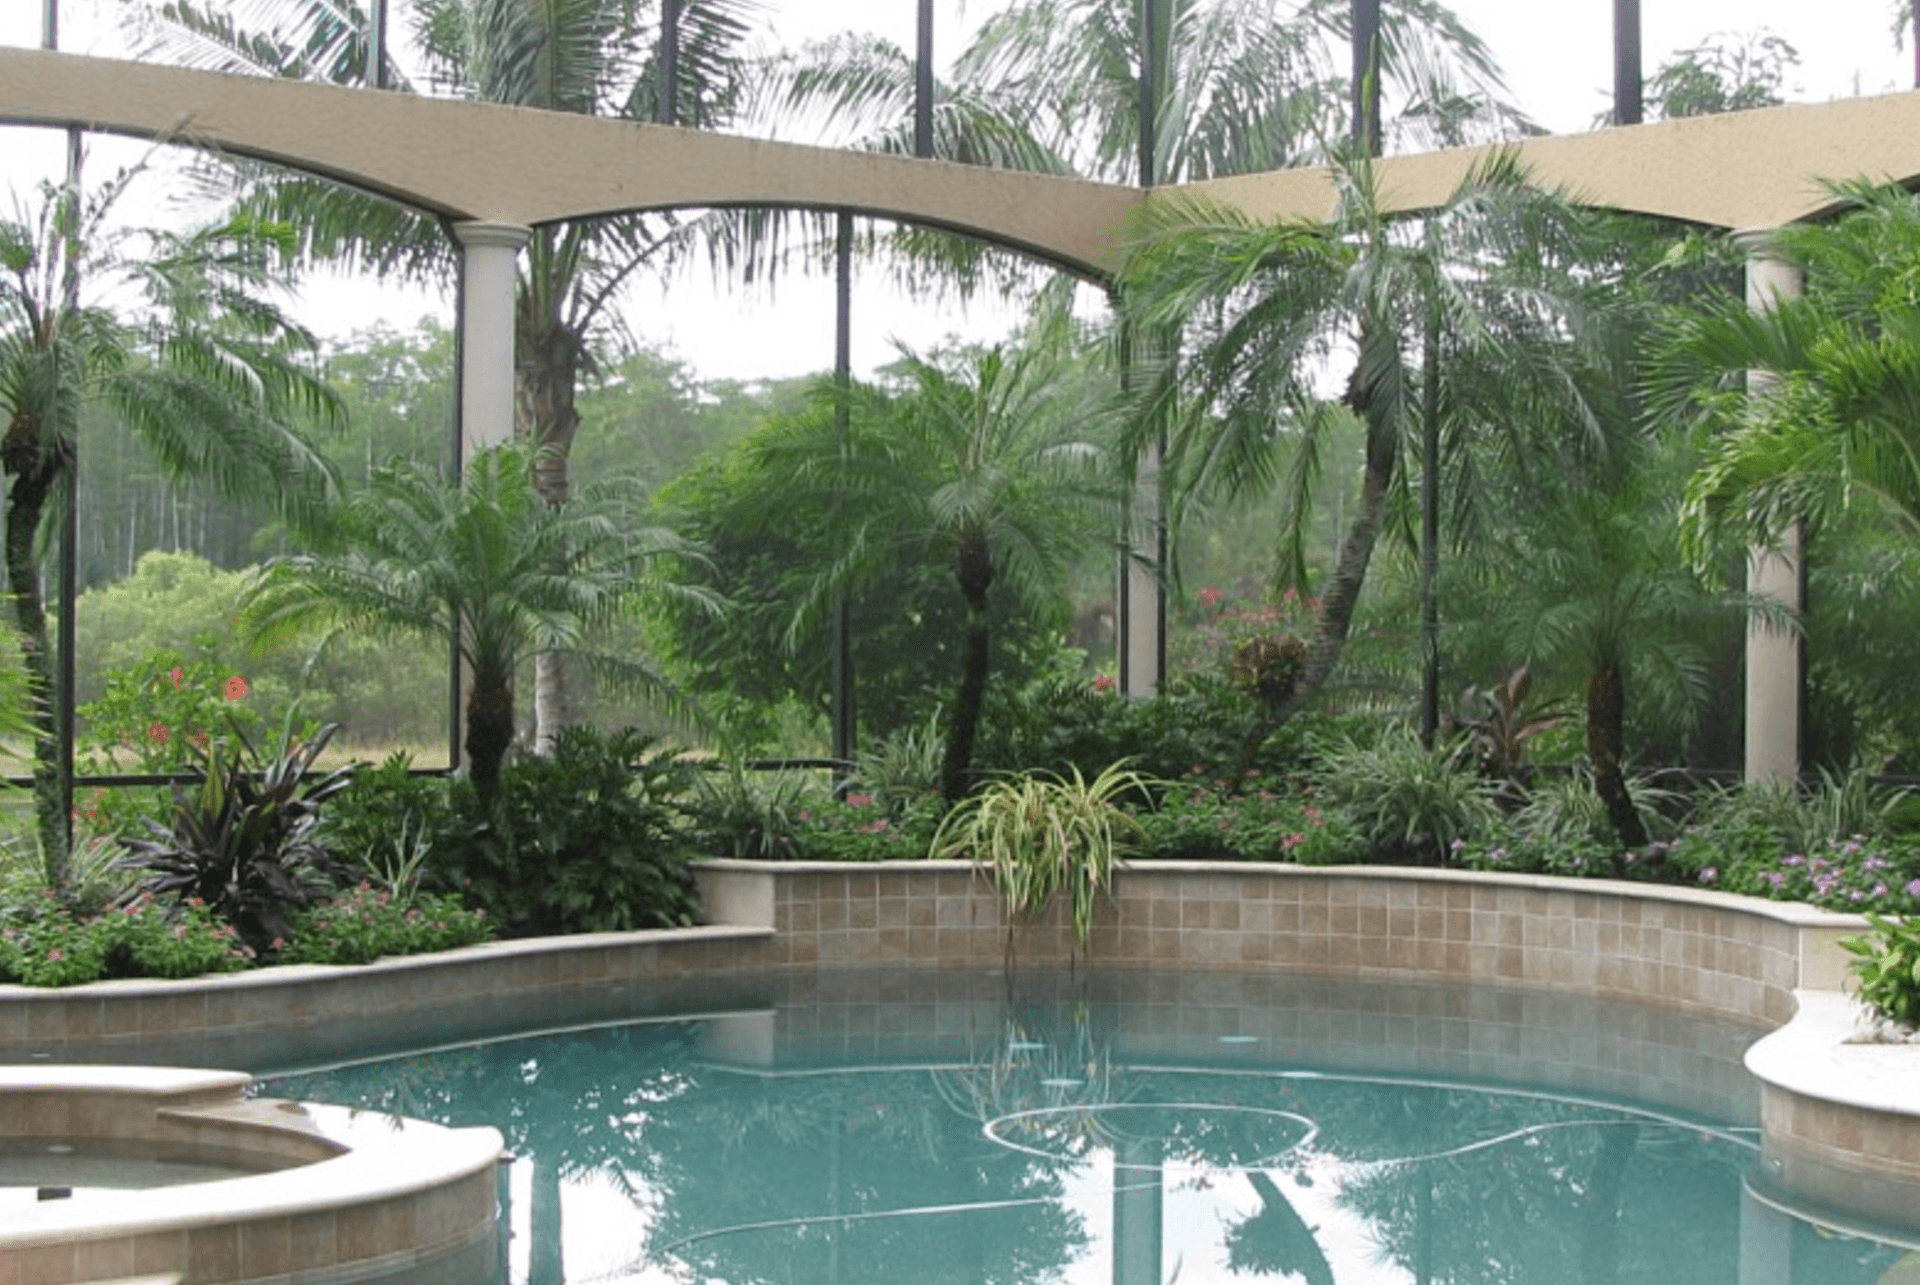 landscaping solutions sod installation panama city fl